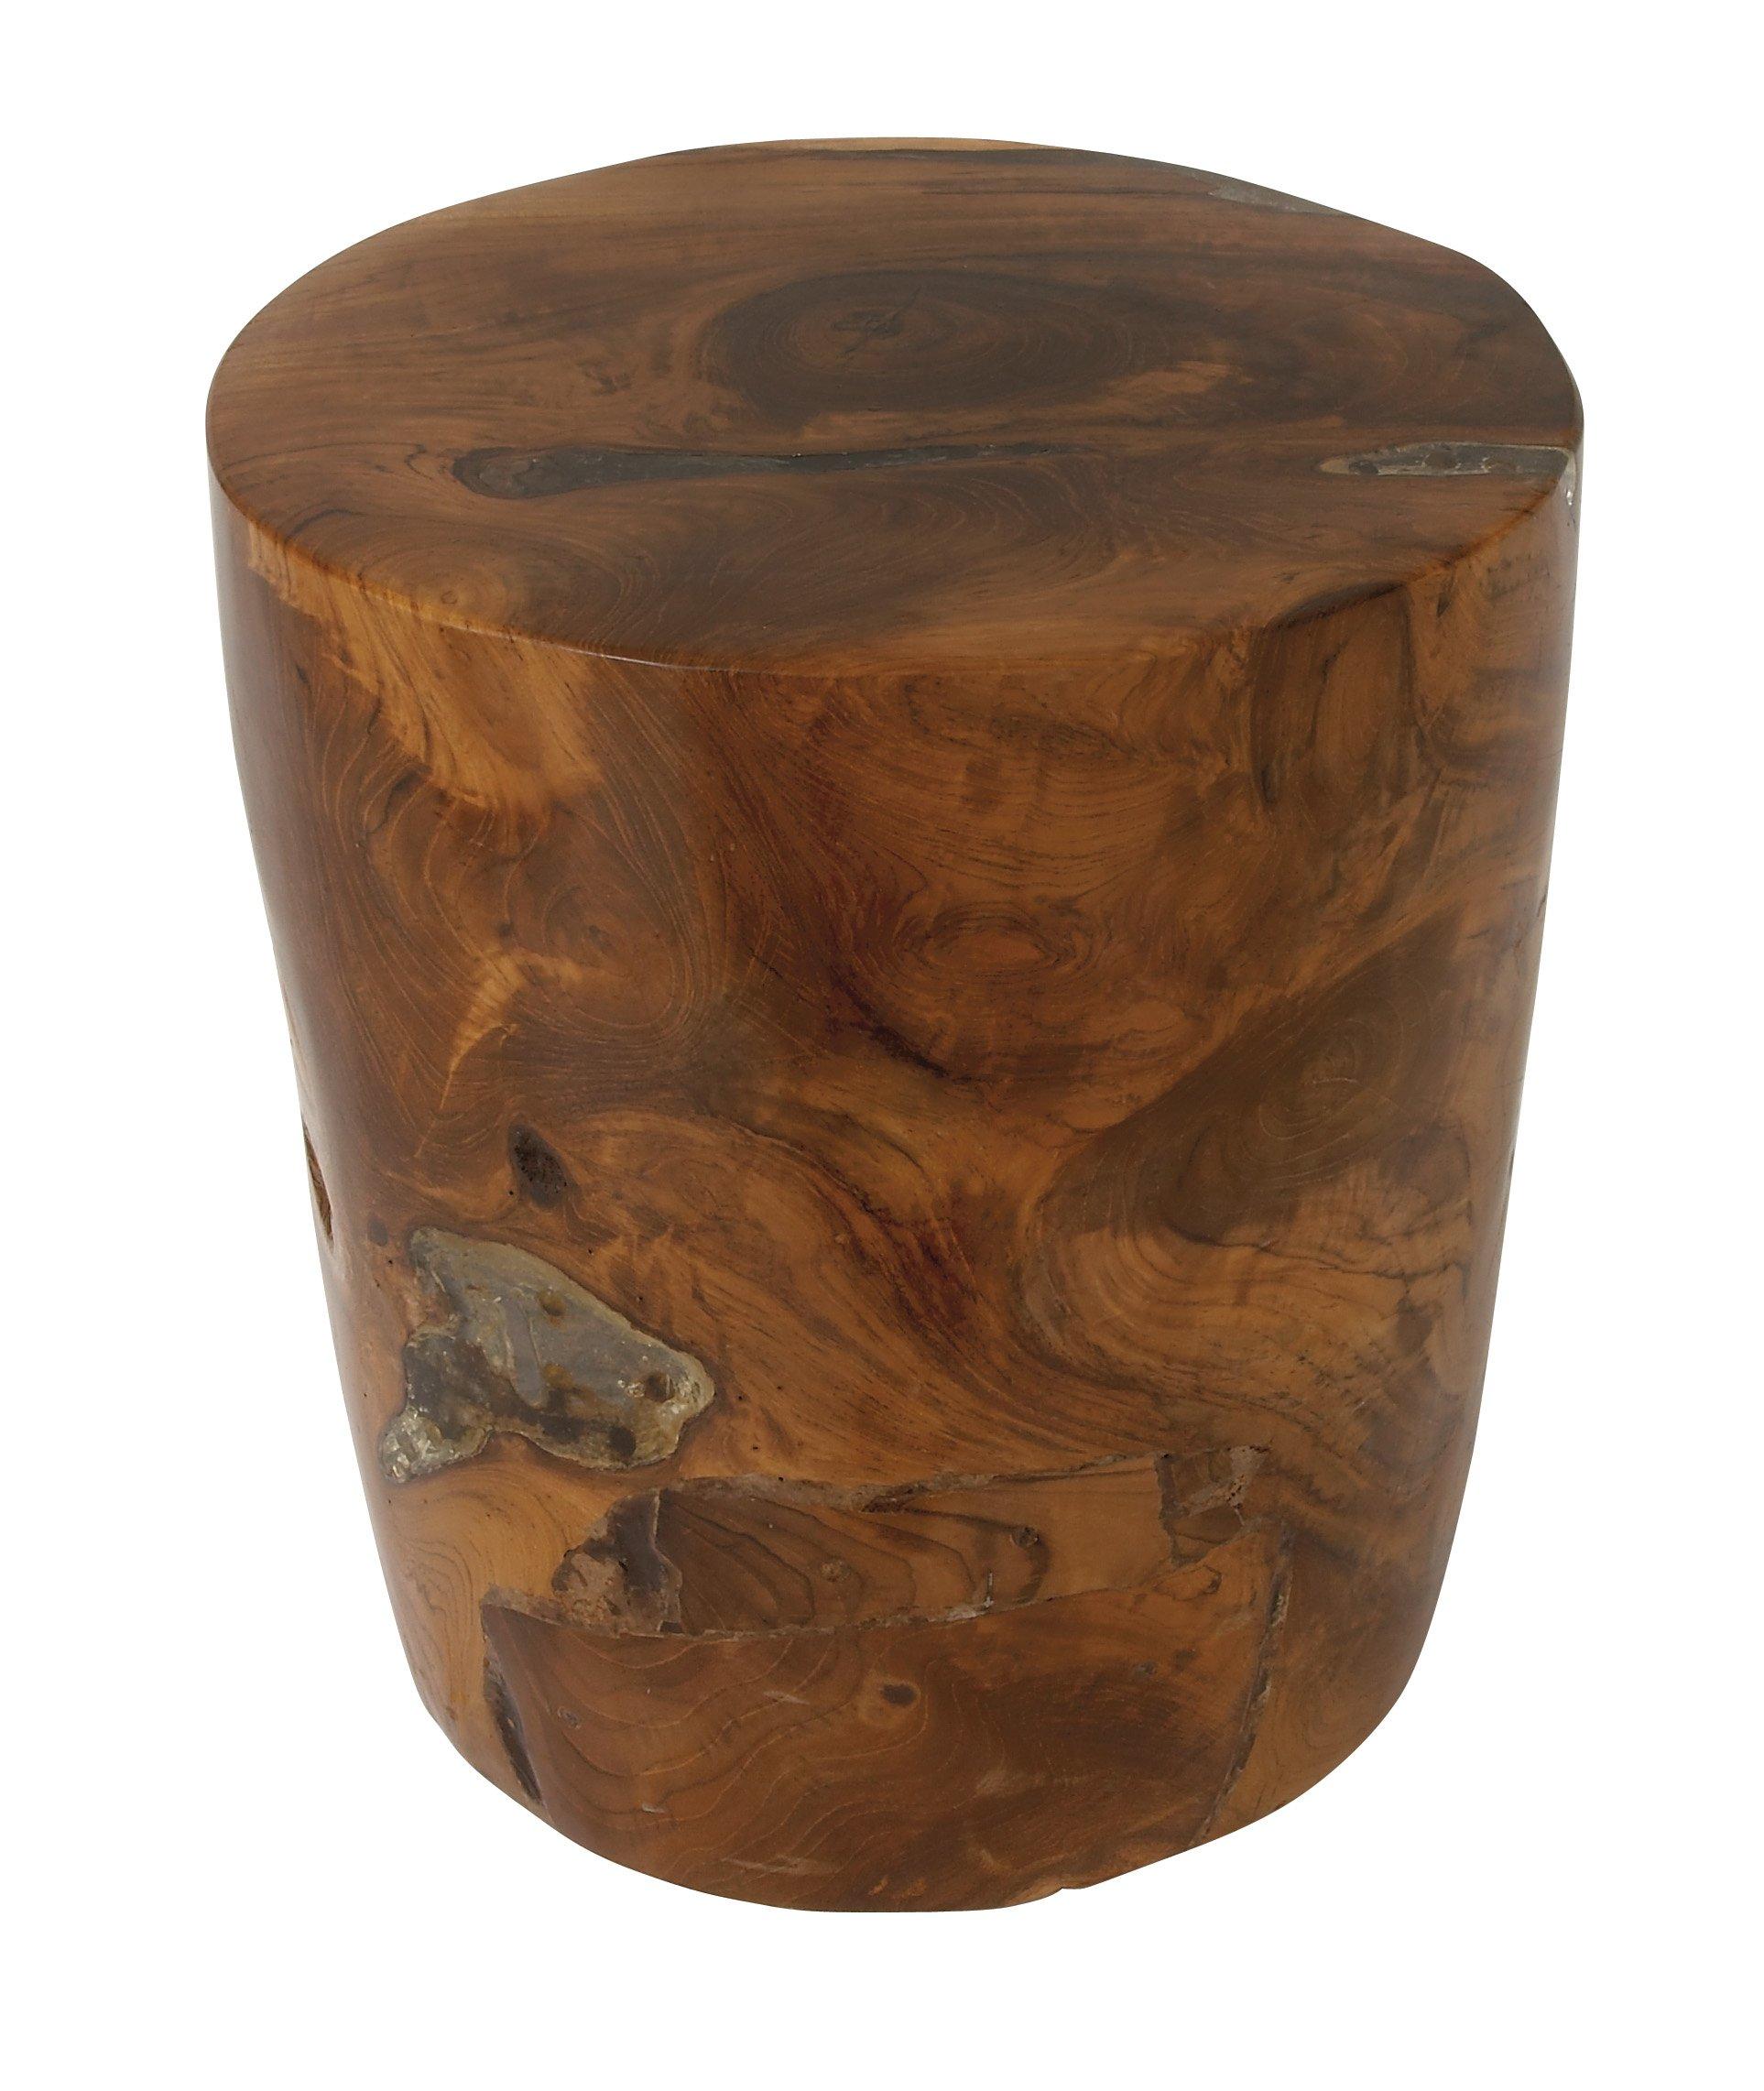 Deco 79 42015 Teak Wood Resin Stool, 14'' x 15''